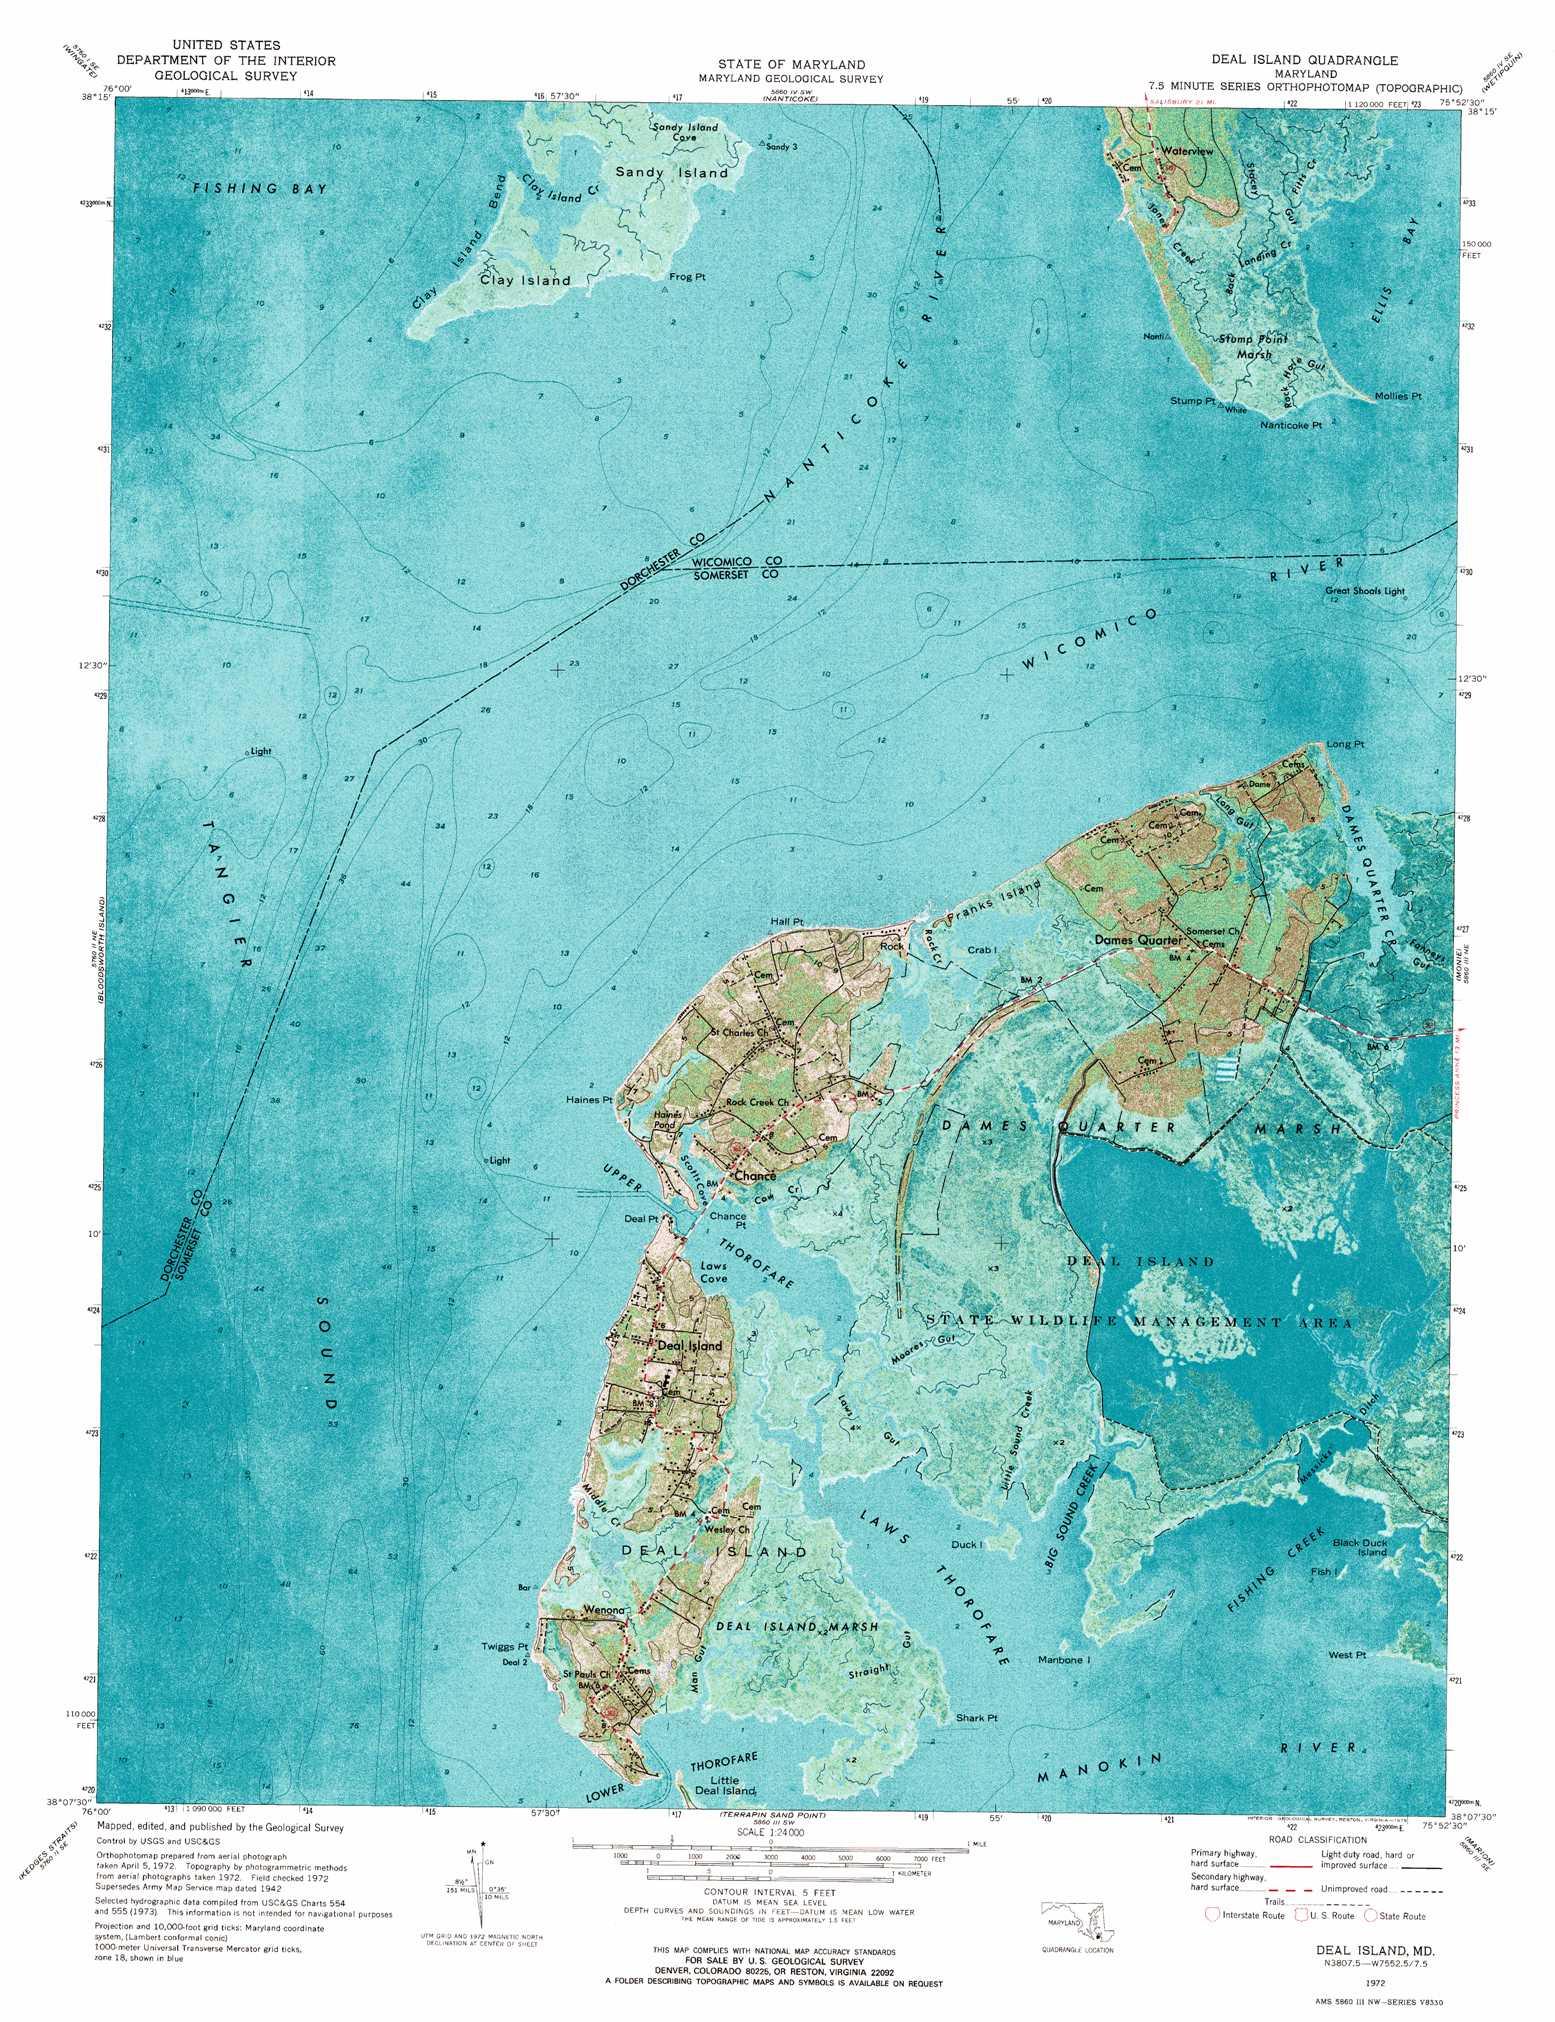 Deal Island topographic map, MD - USGS Topo Quad 38075b8